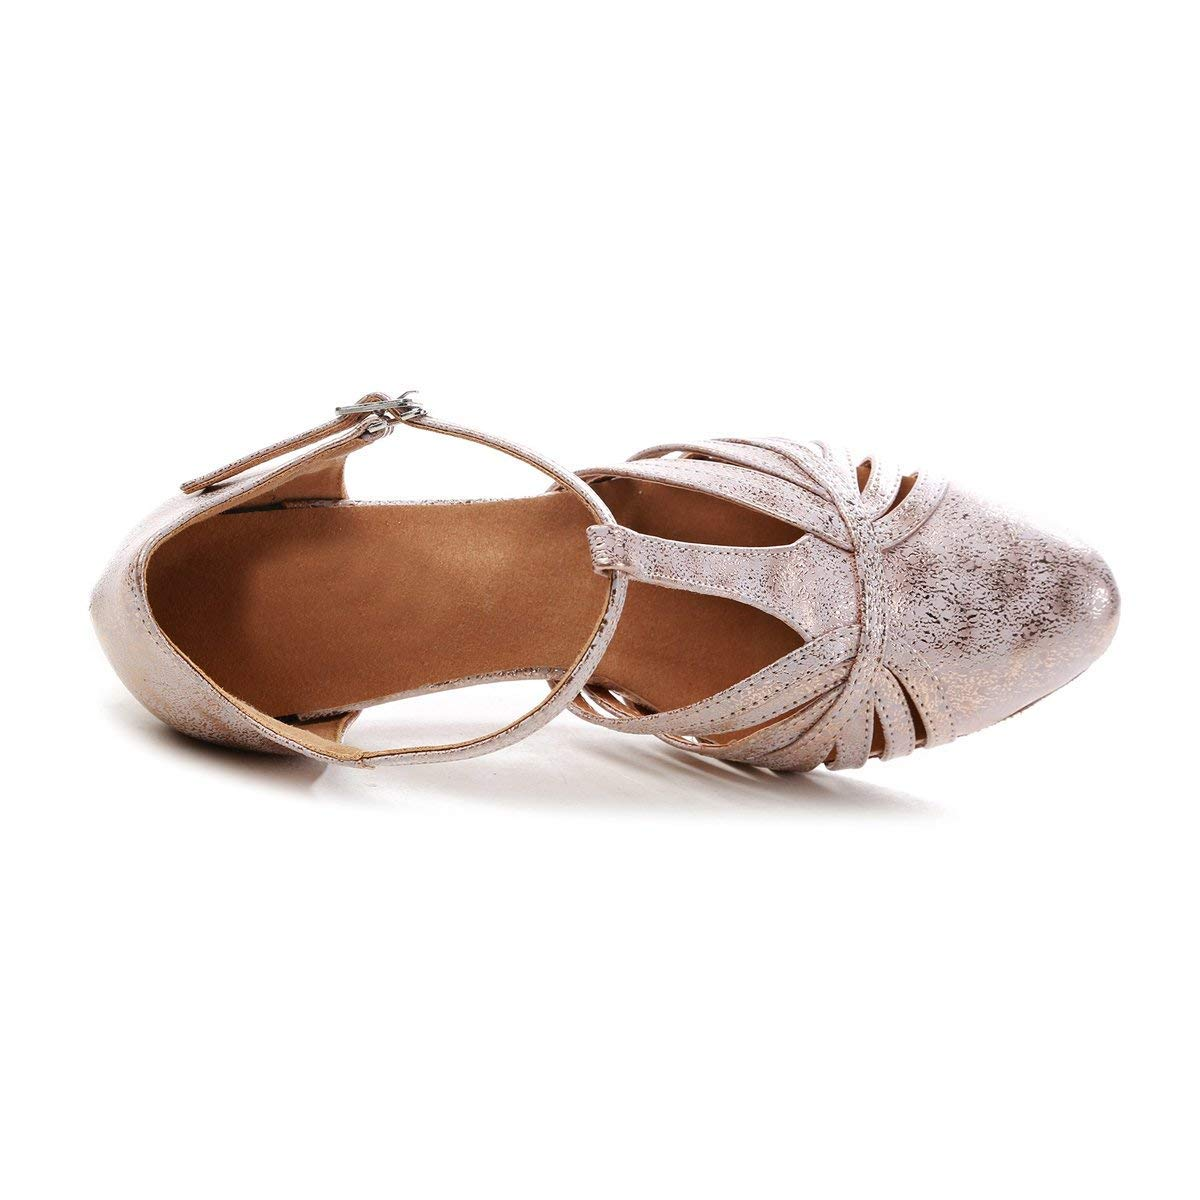 ZHRUI GL259 Frauen T-Strap T-Strap T-Strap Mode Synthetische Latin Ballroom Dance Schuhe Party Pumps (Farbe   Rosa-7.5cm Heel, Größe   5 UK) 6c4805